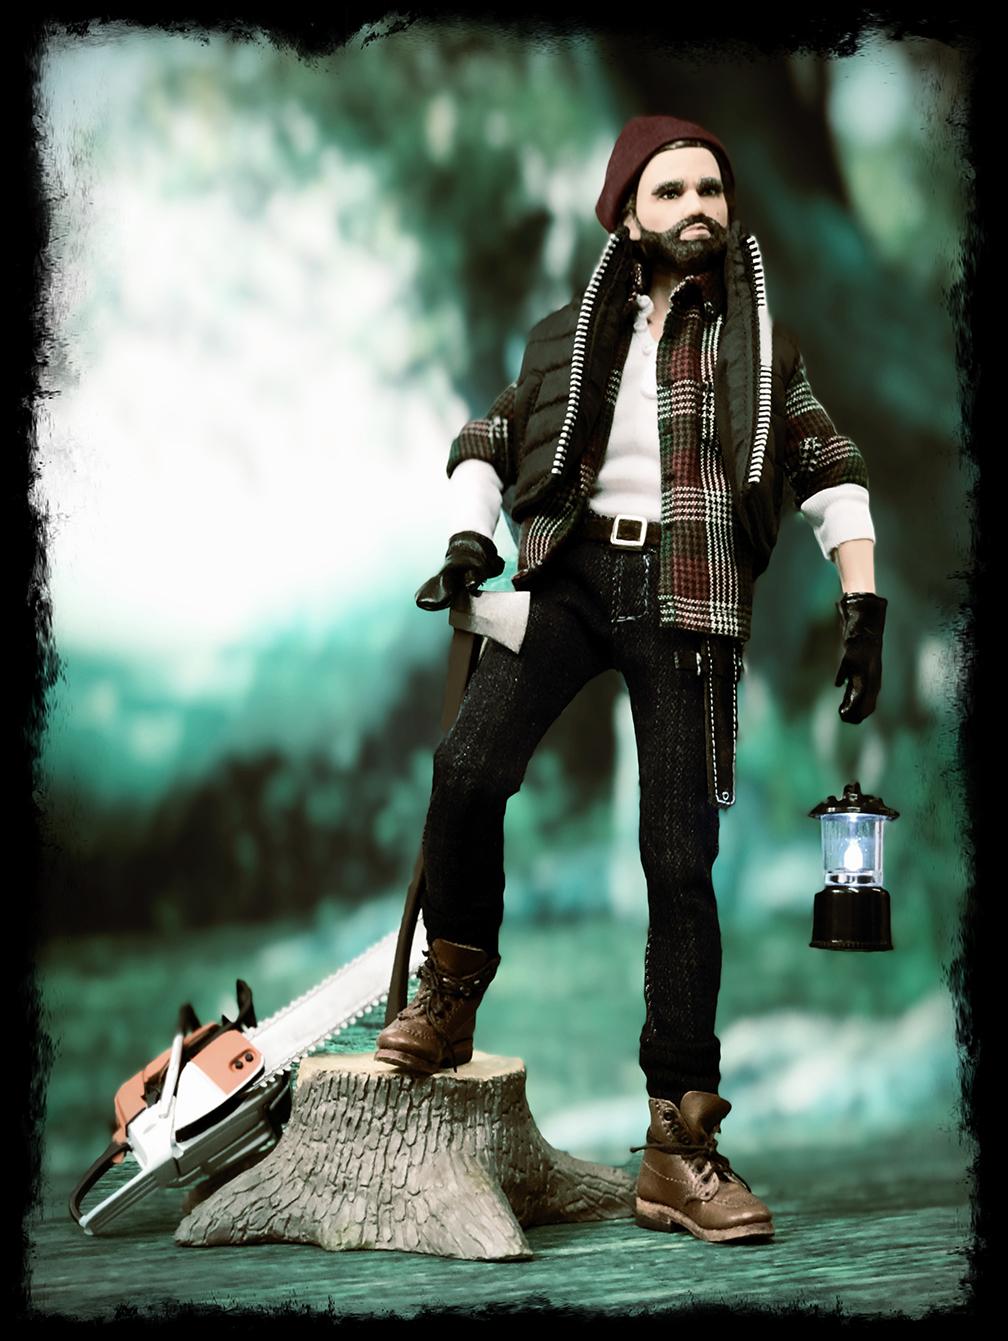 Lumberjack Ken